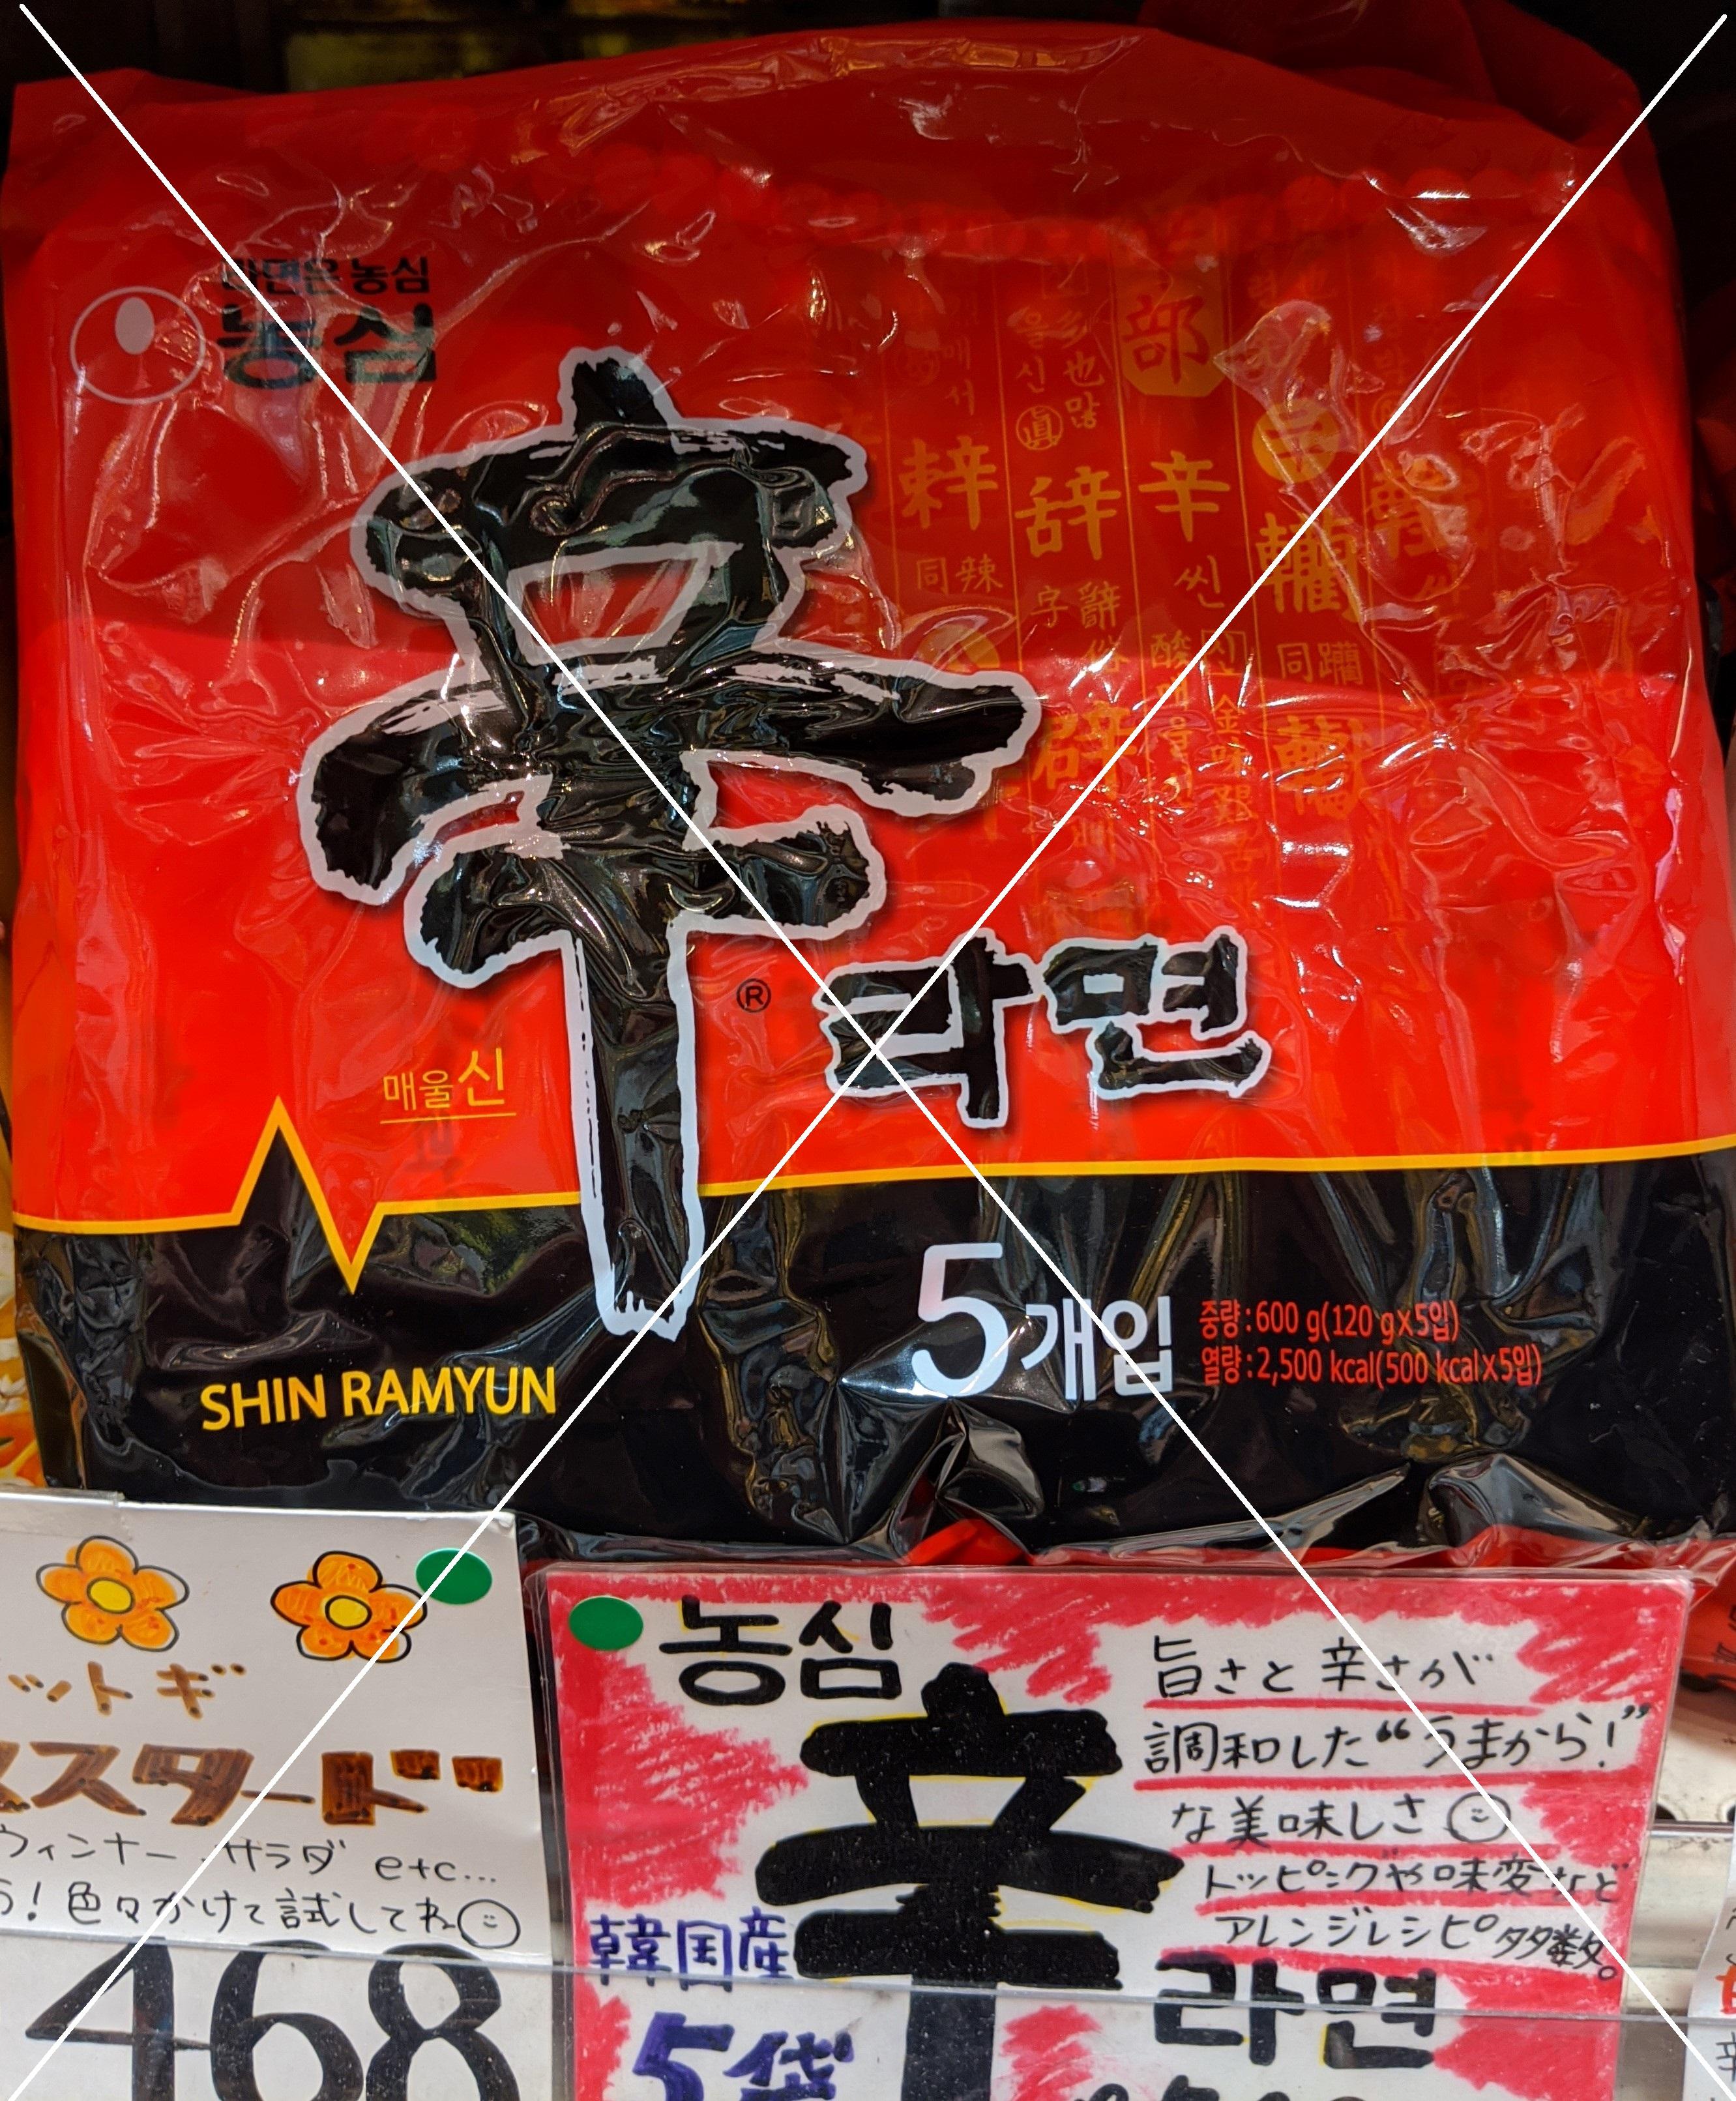 shin ramen made in korea front of package